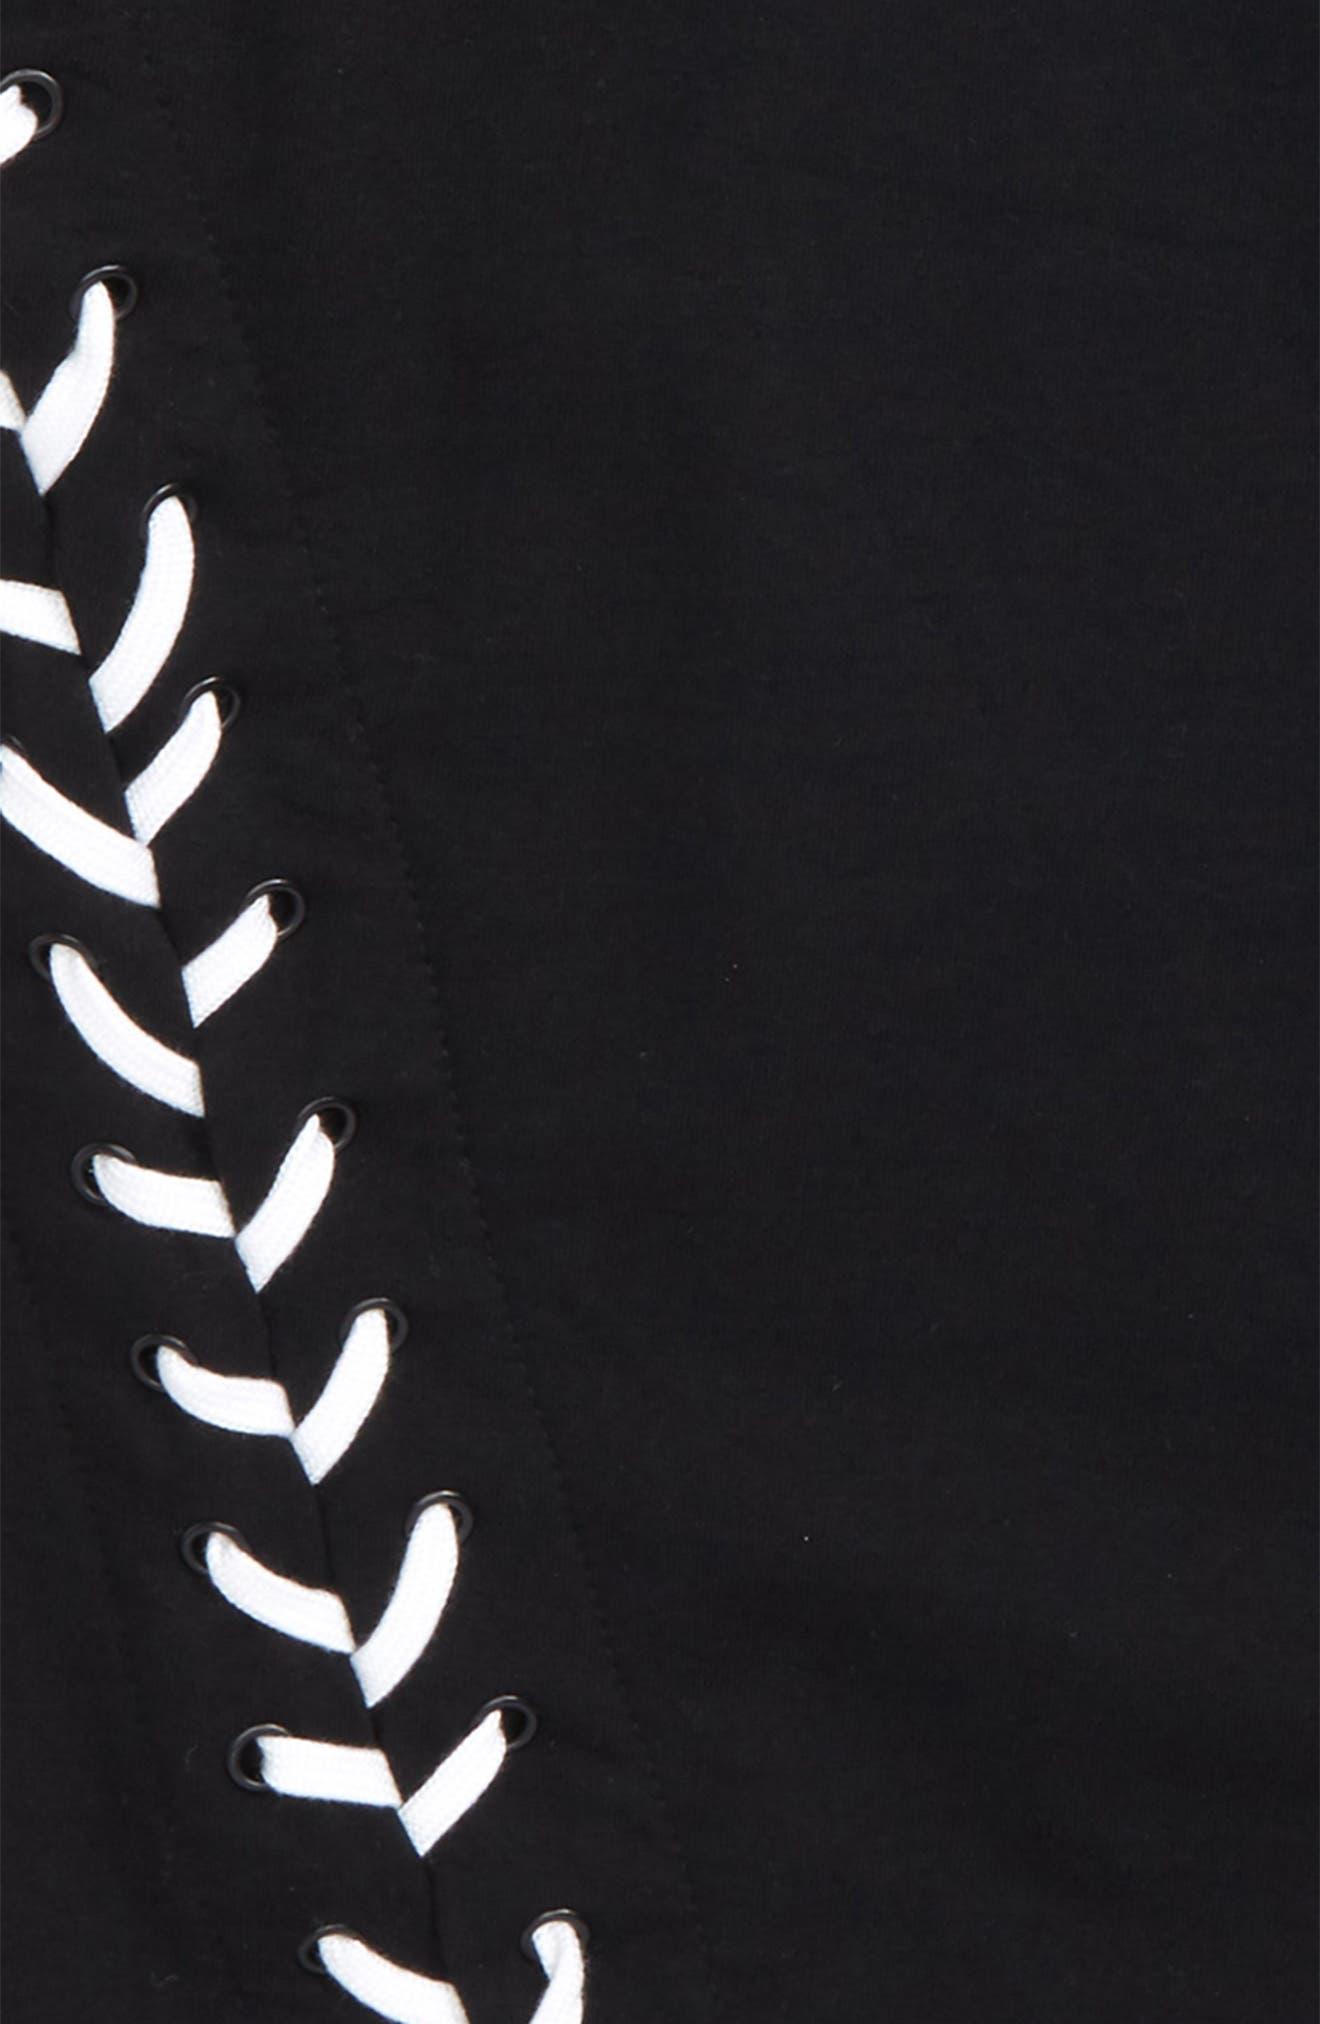 Adorn Sweatshirt Dress,                             Alternate thumbnail 3, color,                             001